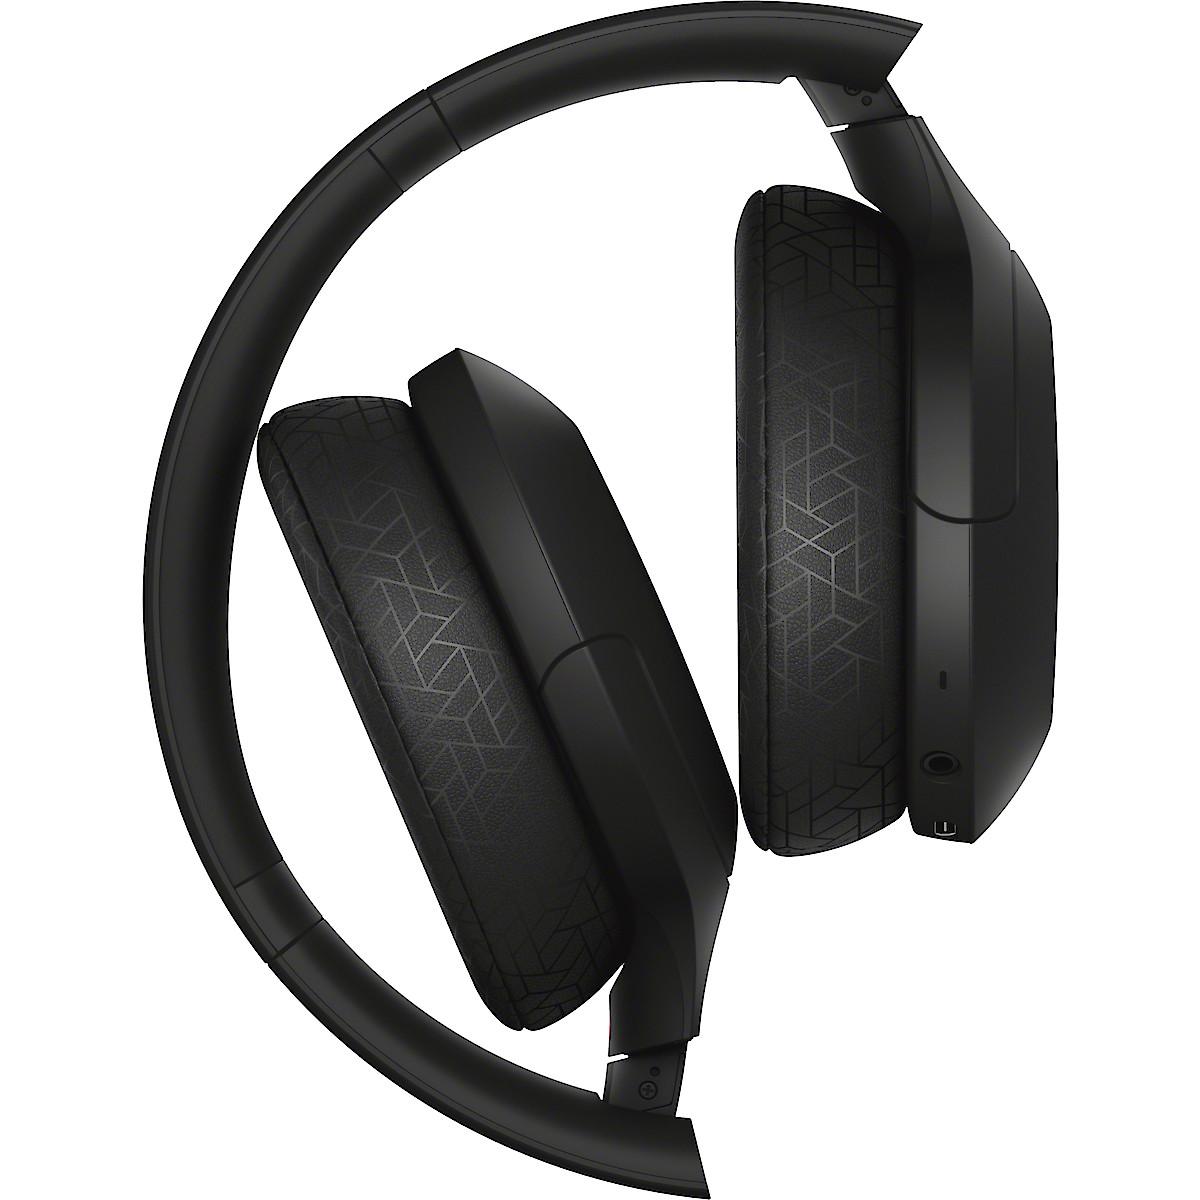 Sony WH-H910N, trådlösa brusreducerande hörlurar.